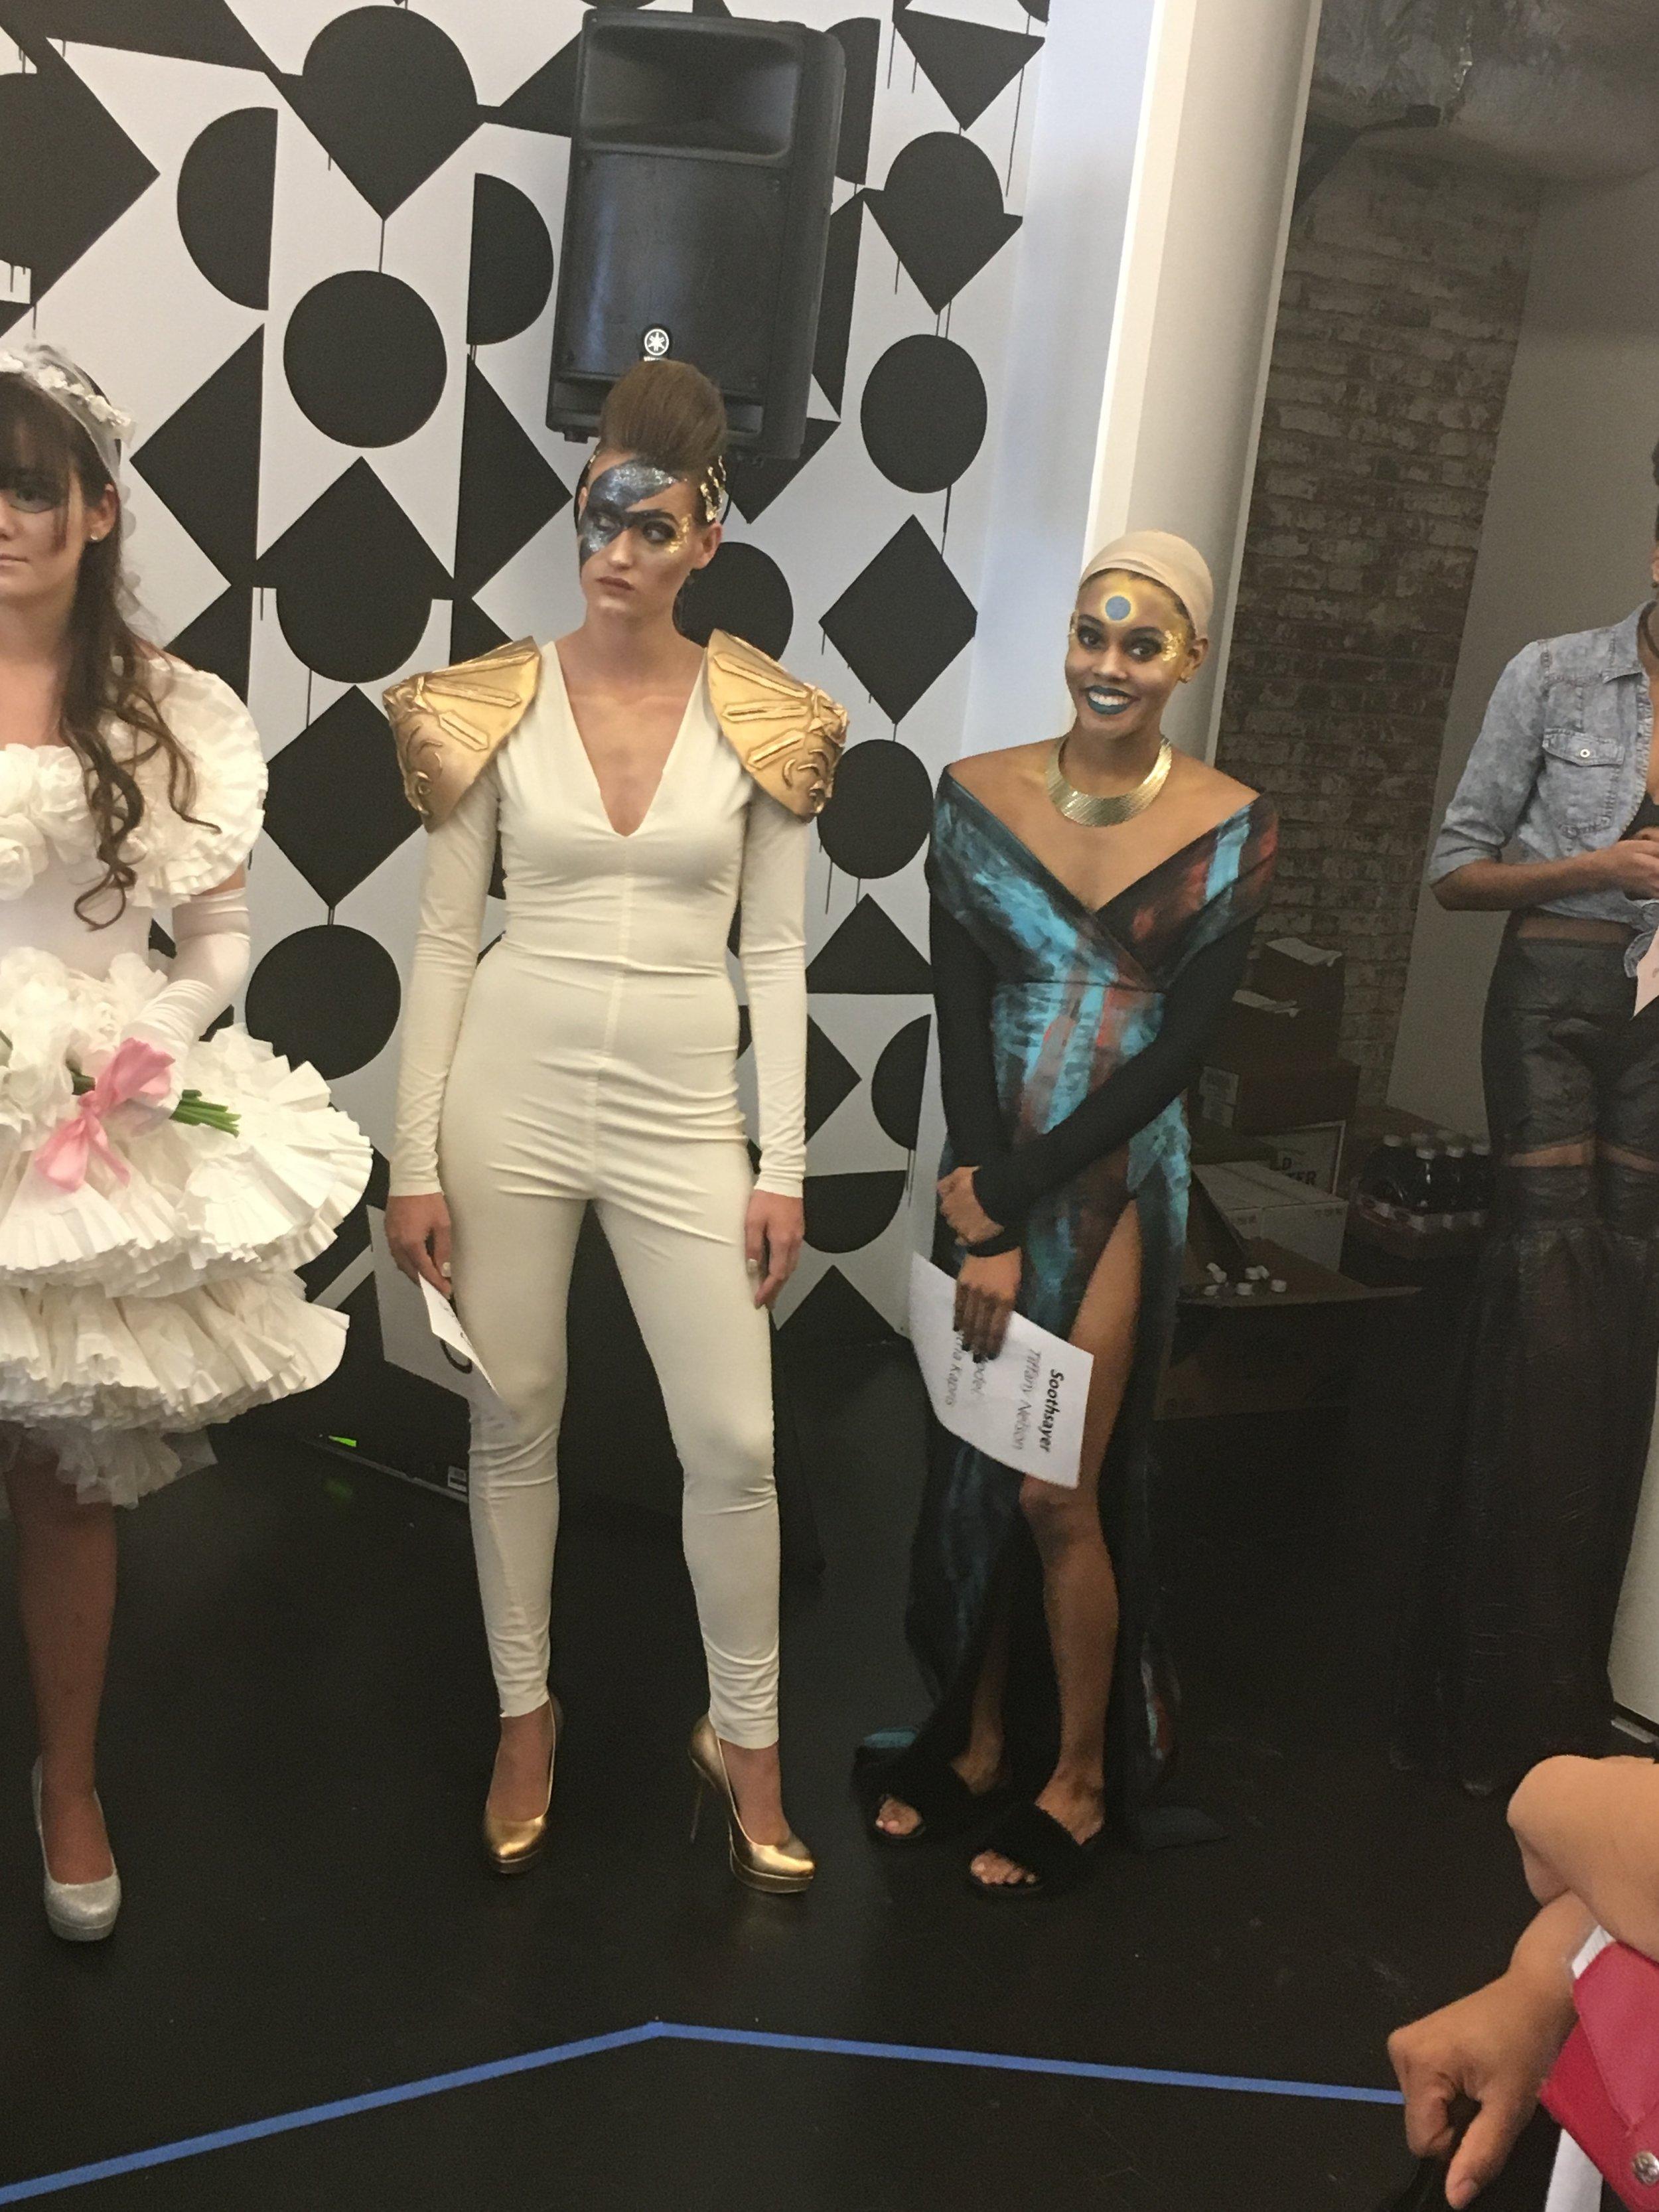 runway dress rehearsal